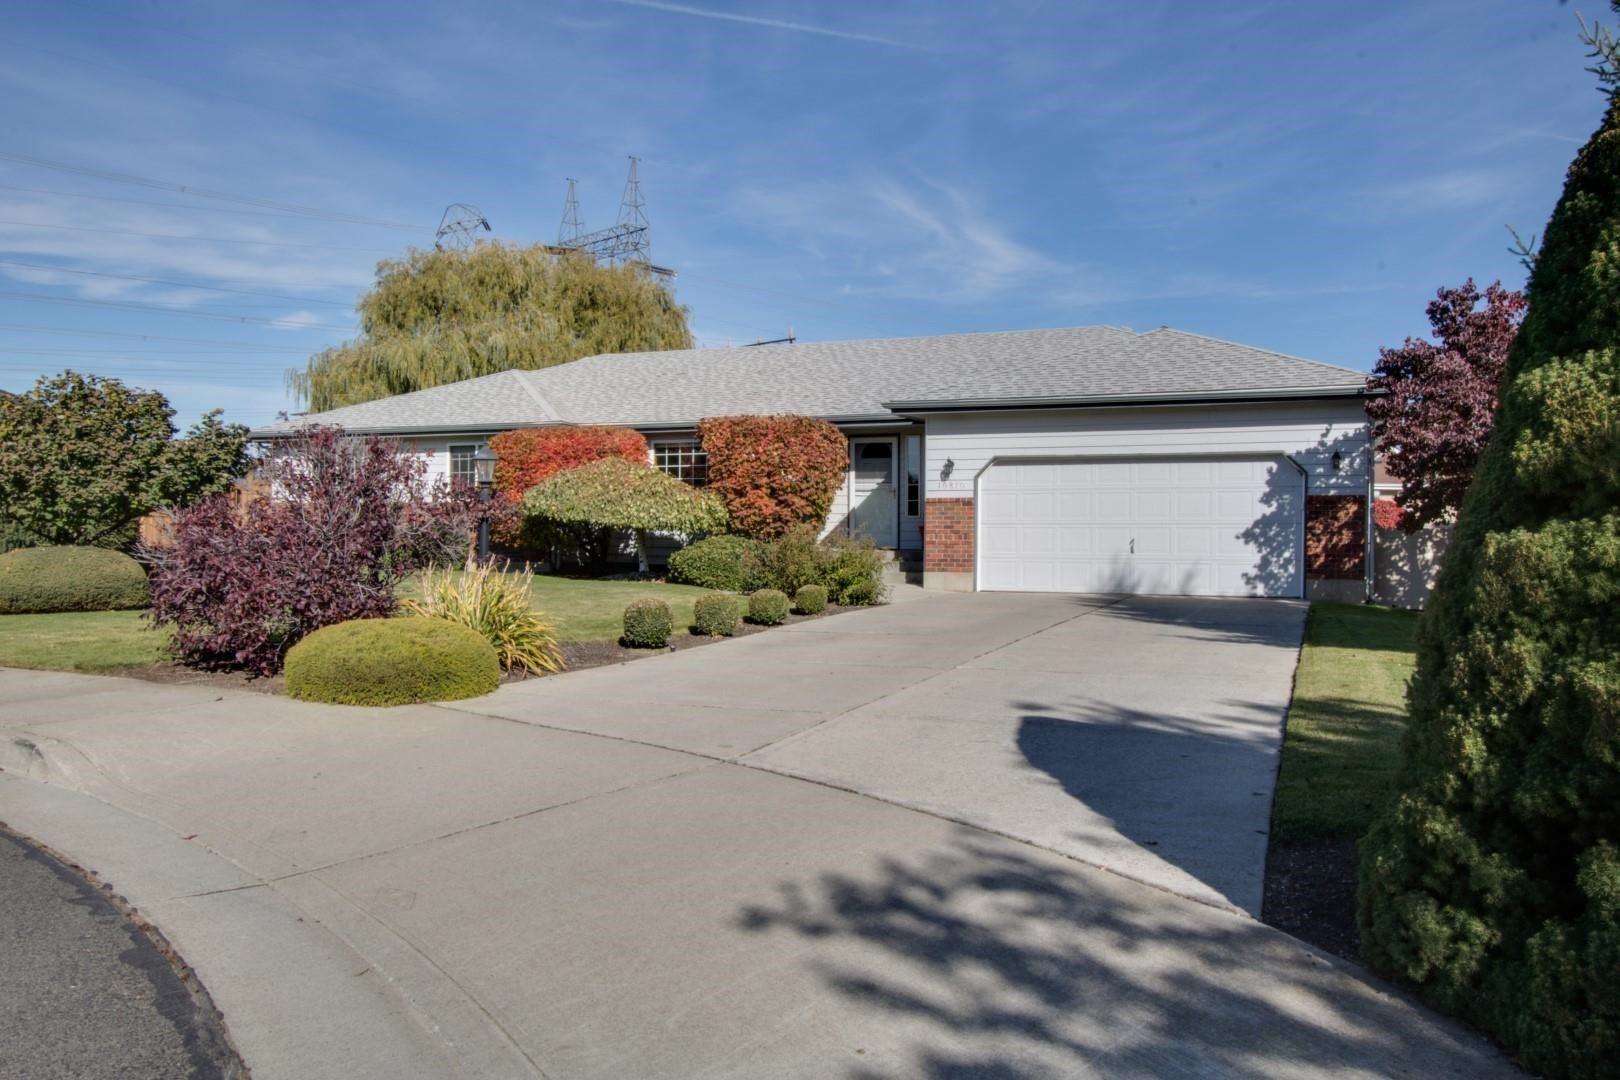 Photo of 10810 N Klickitat Ct, Spokane, WA 99208-9043 (MLS # 202124117)